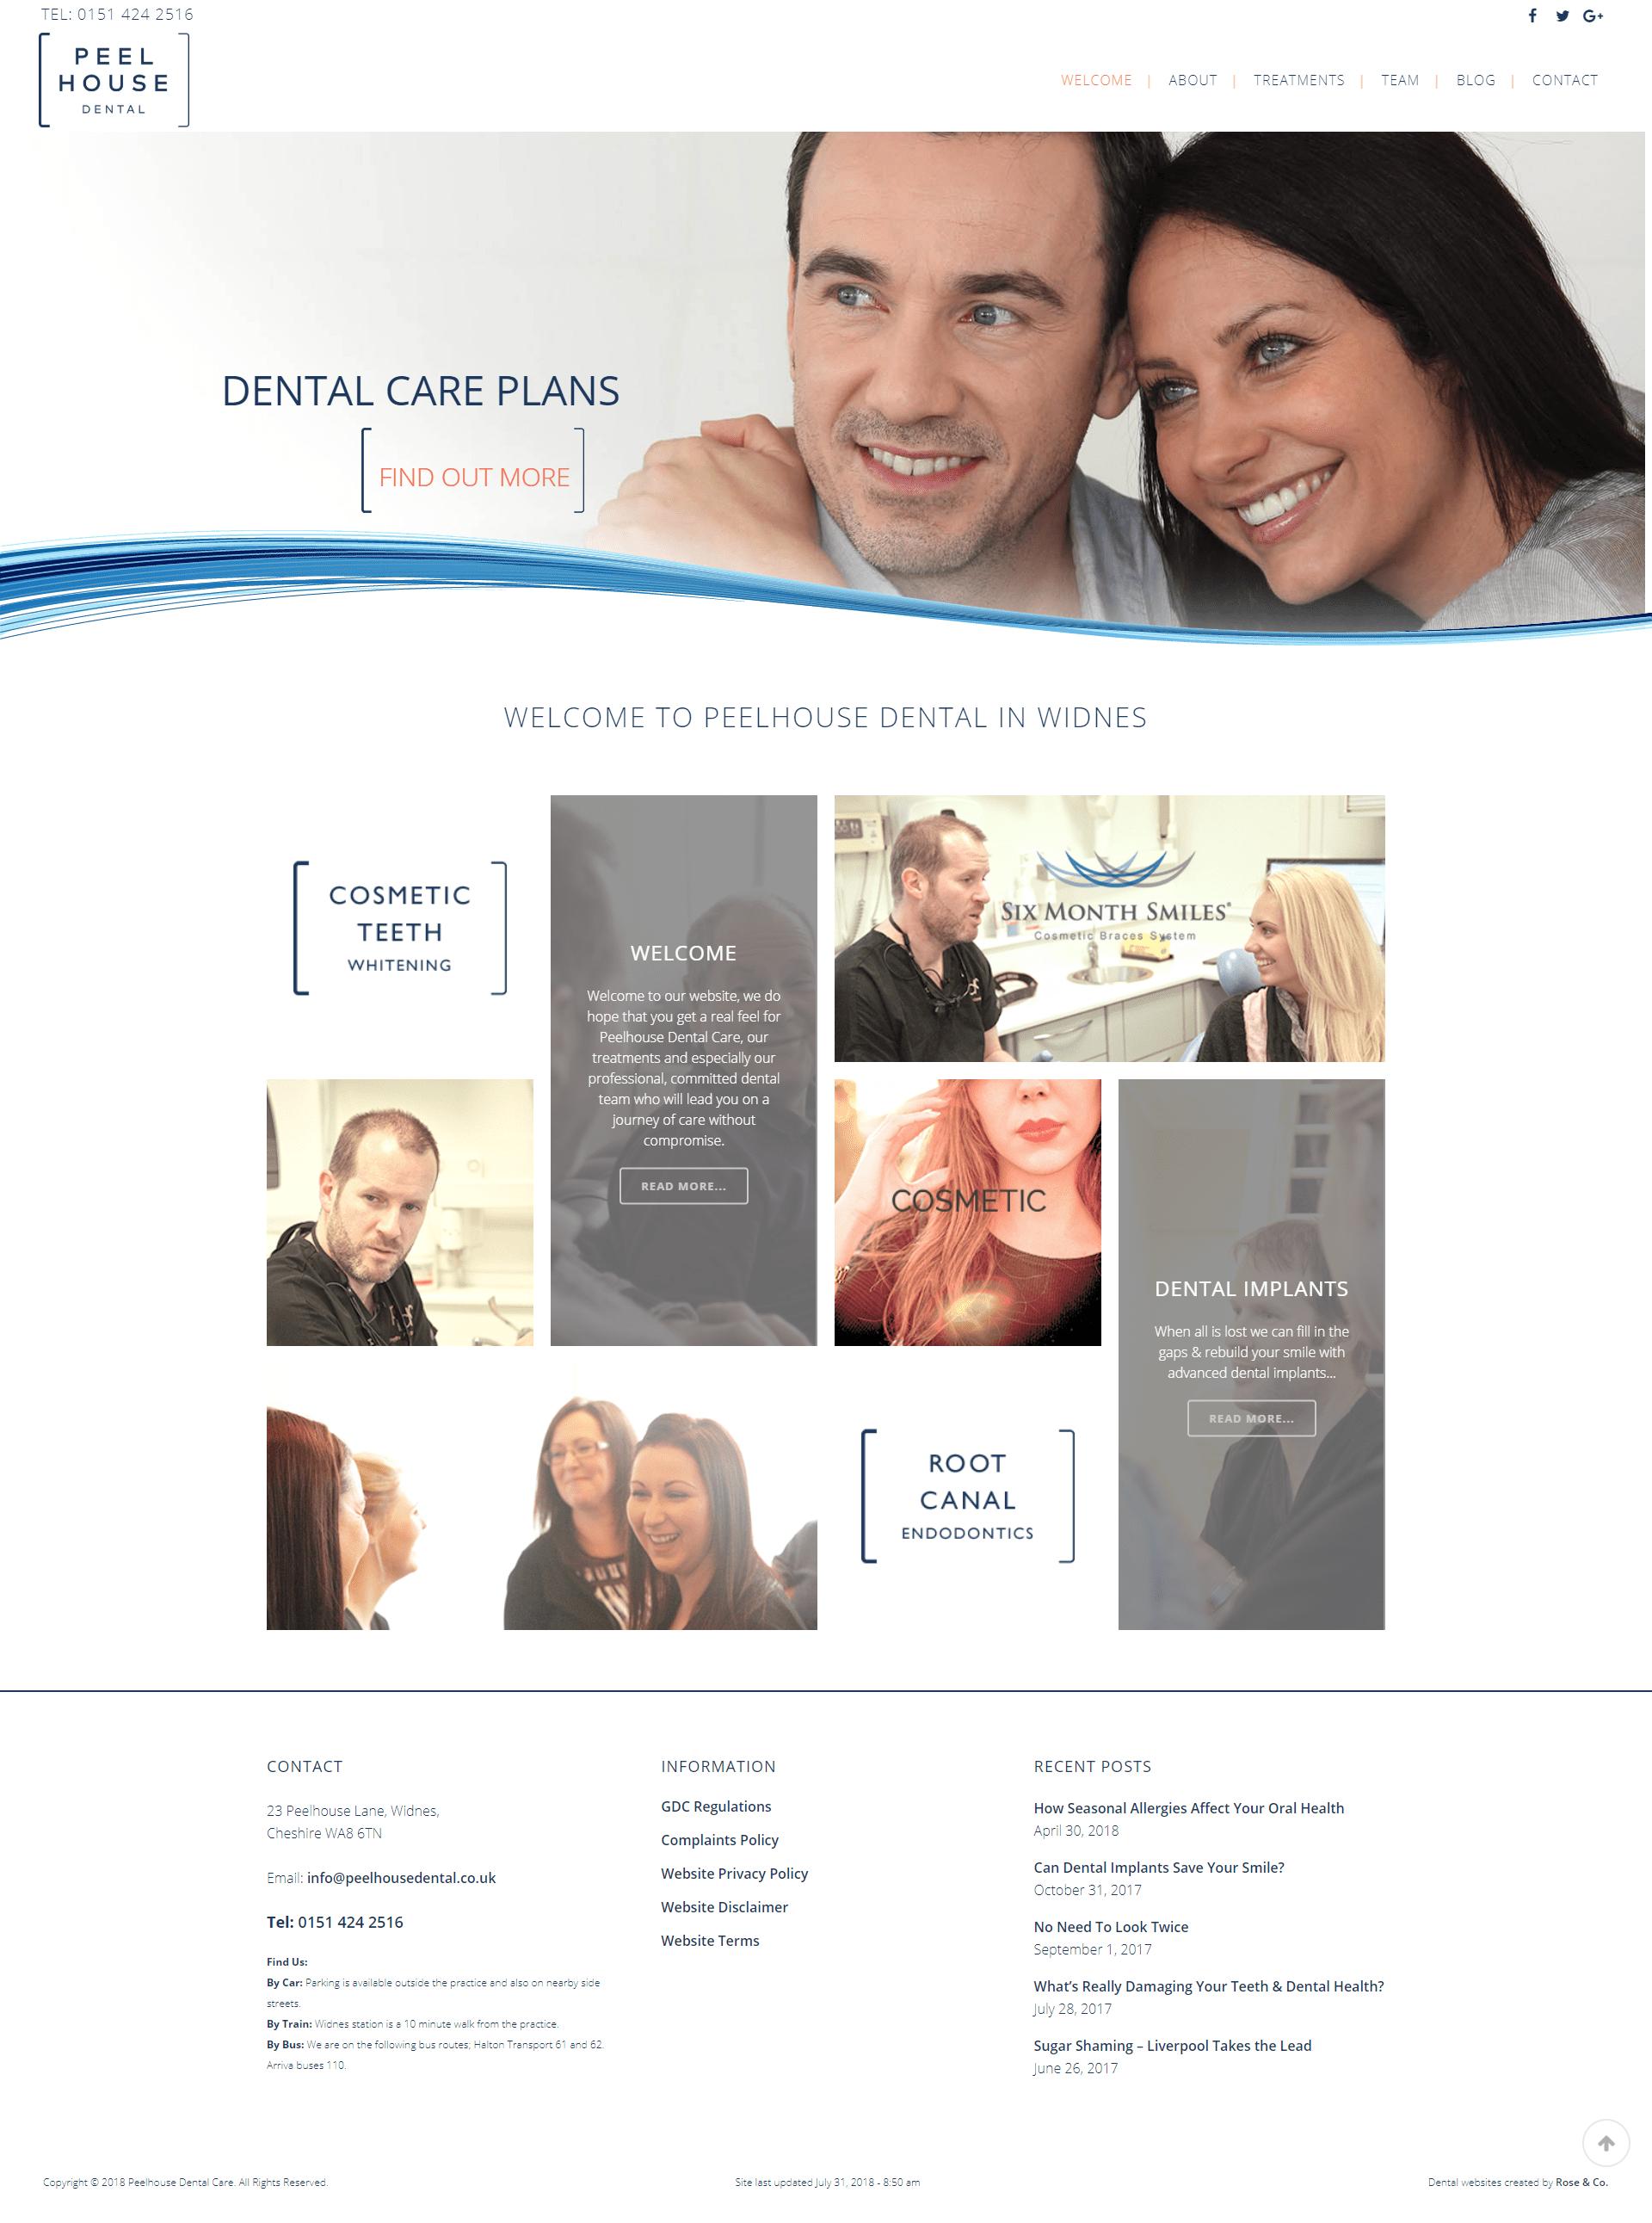 peelhouse dental website